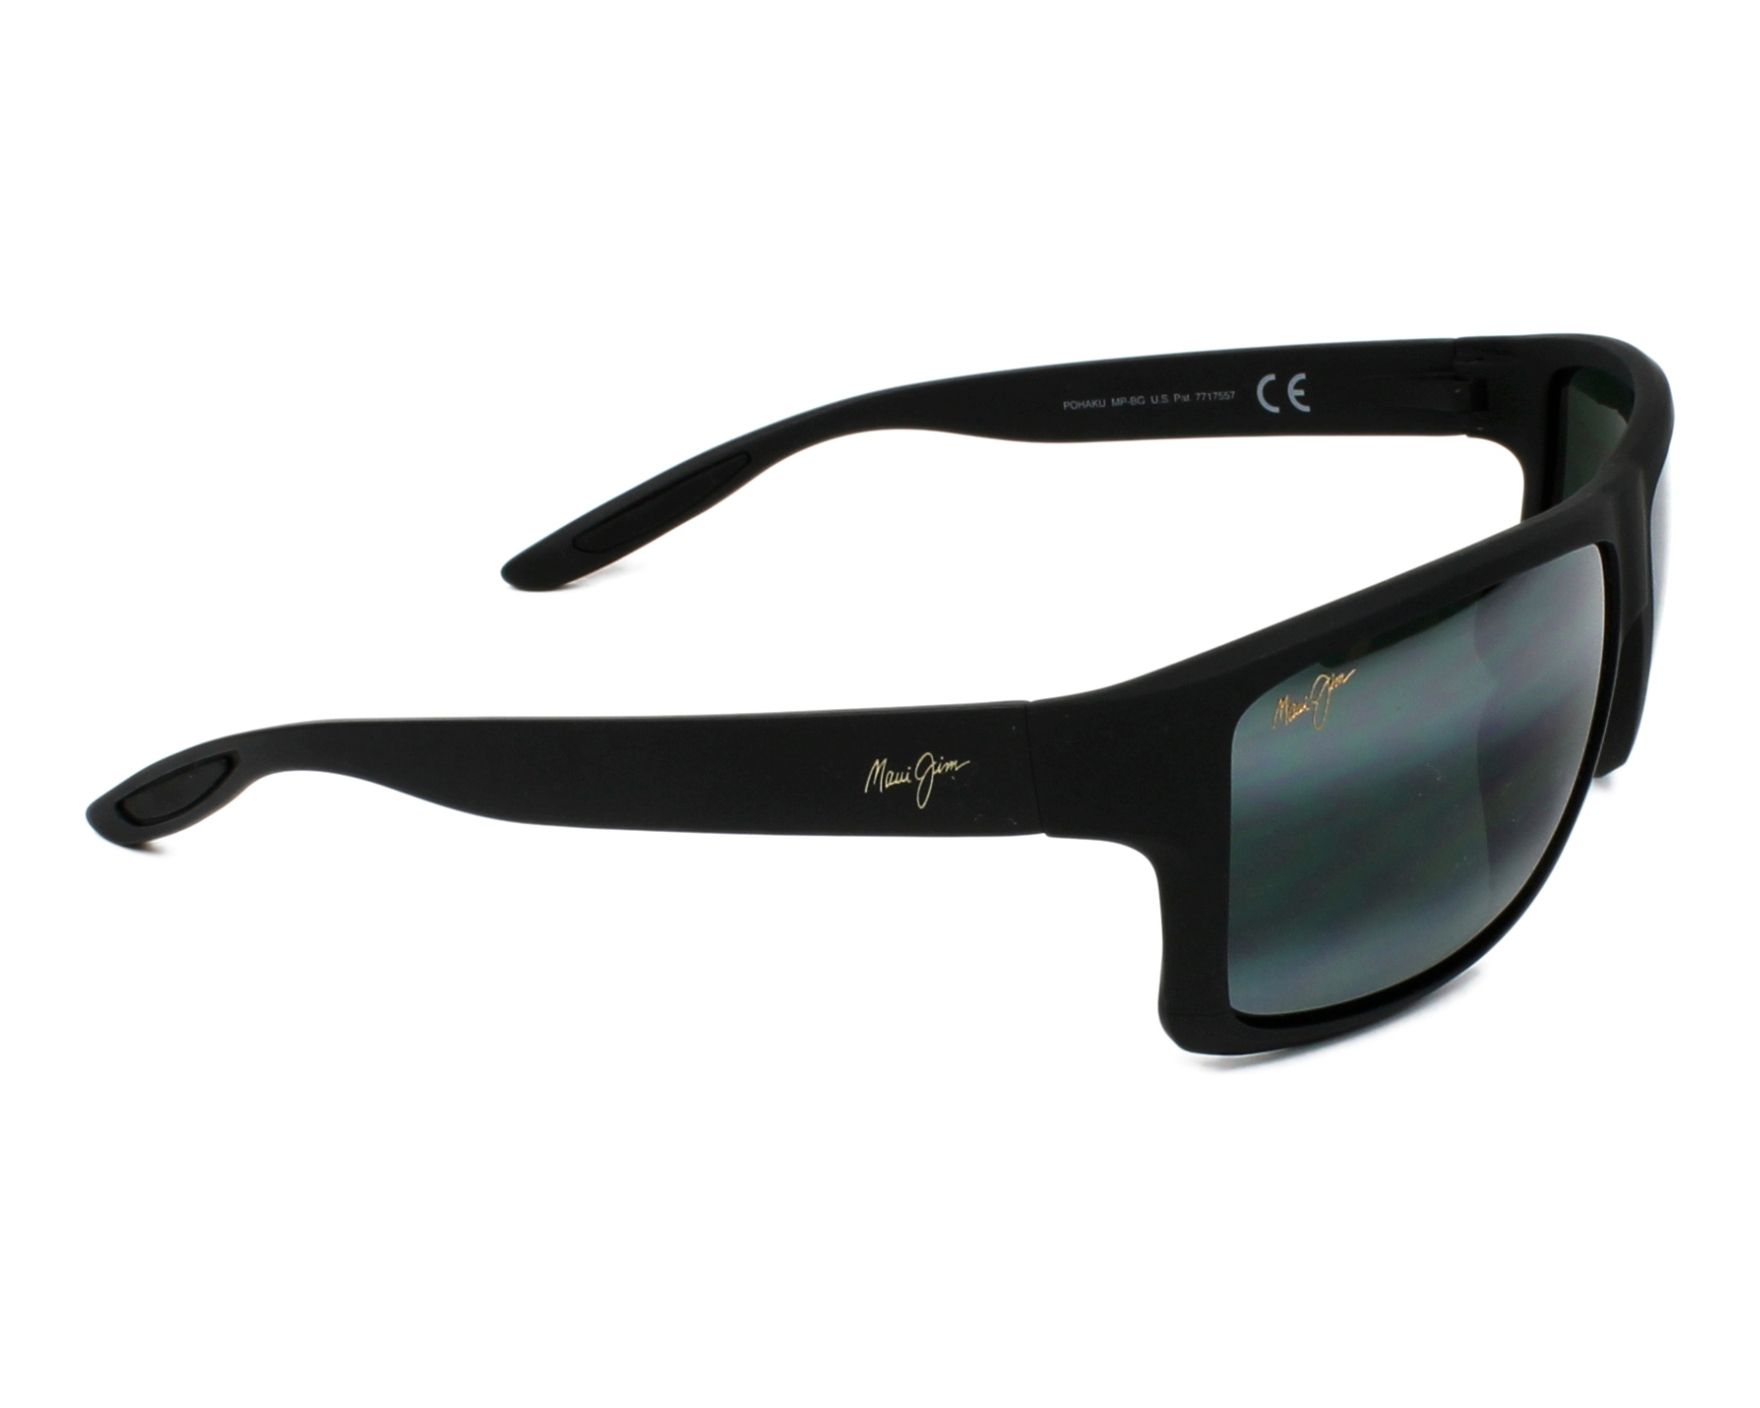 f78b541a27d6 Sunglasses Maui Jim 528 2M 62-15 Black side view